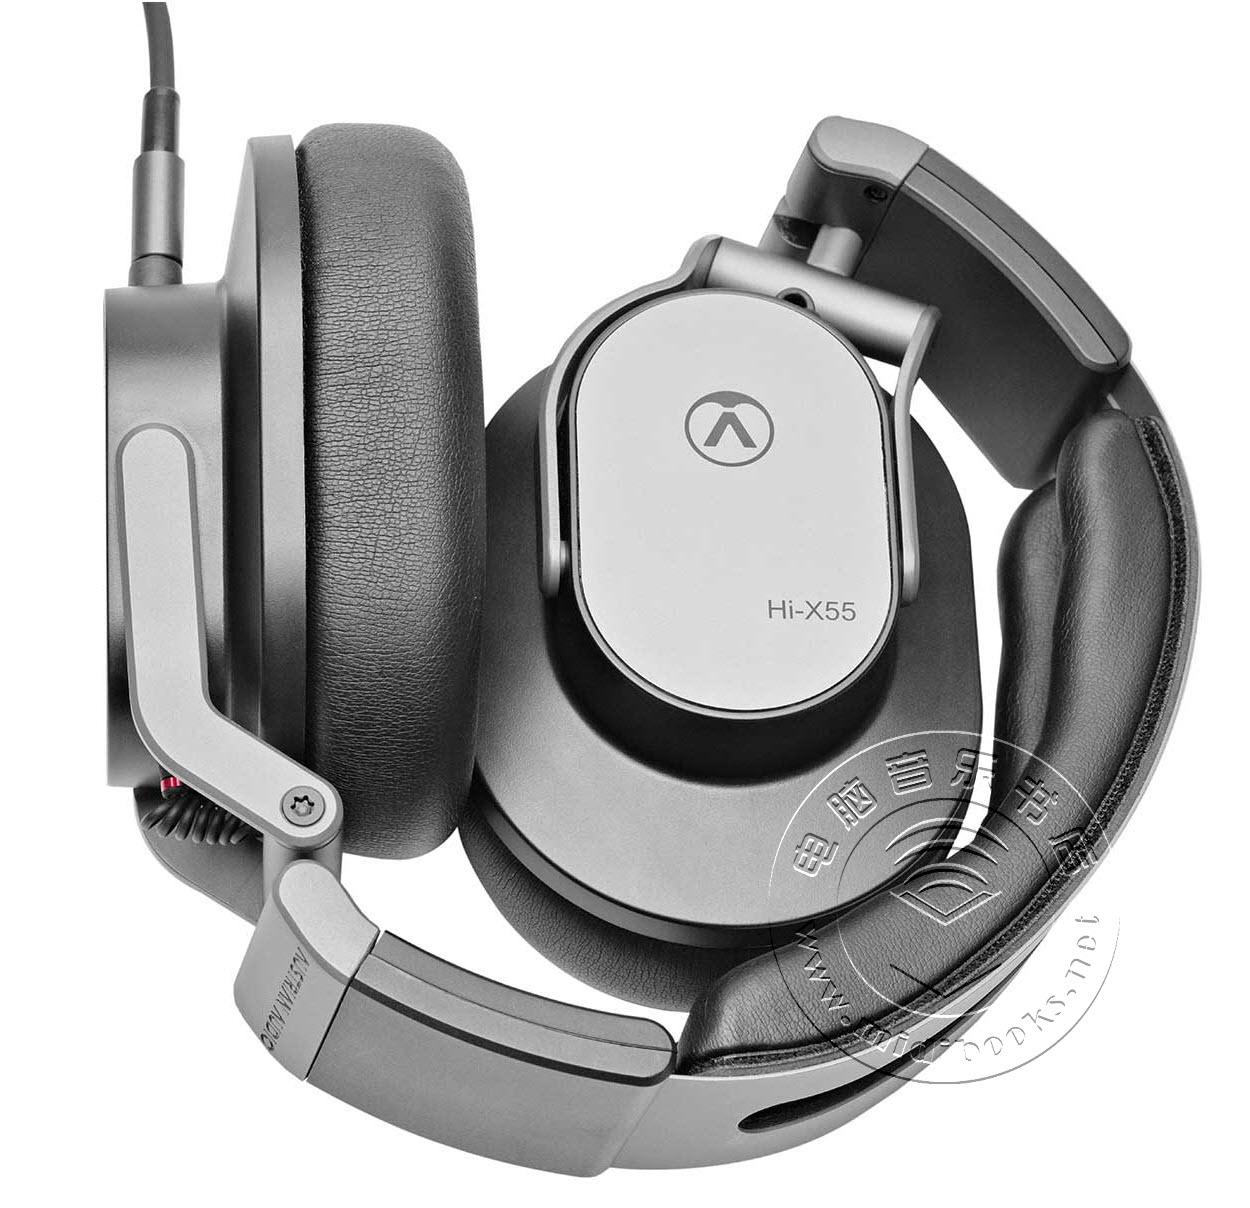 Austrian Audio(奥地利音频)发布专业监听耳机Hi-X55